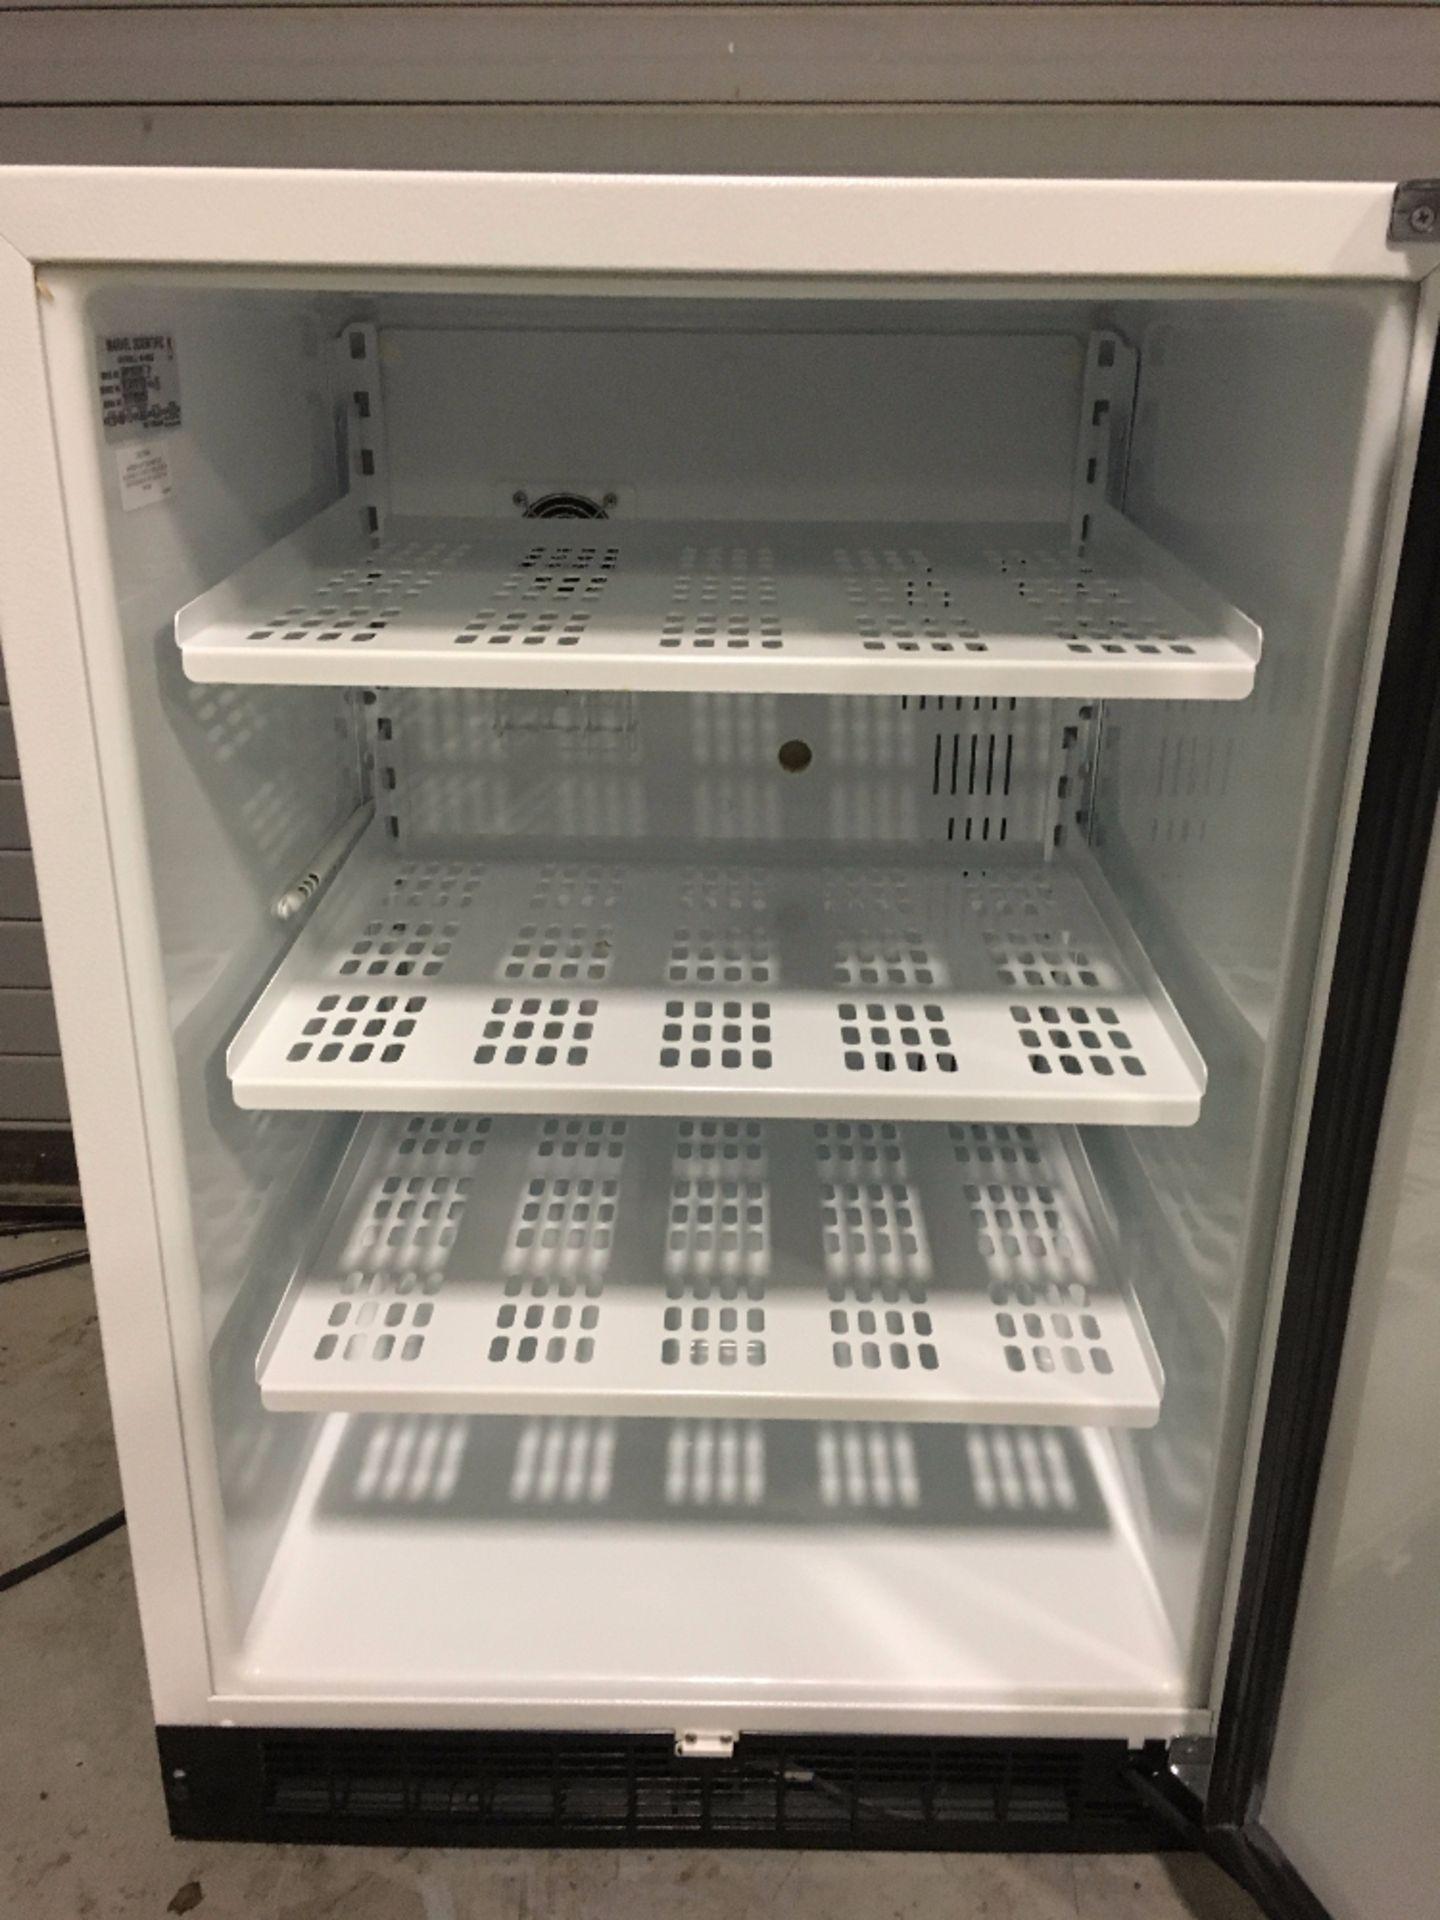 Marvel Scientific Model 6RFXWWR Refrigeration Unit - Image 2 of 2